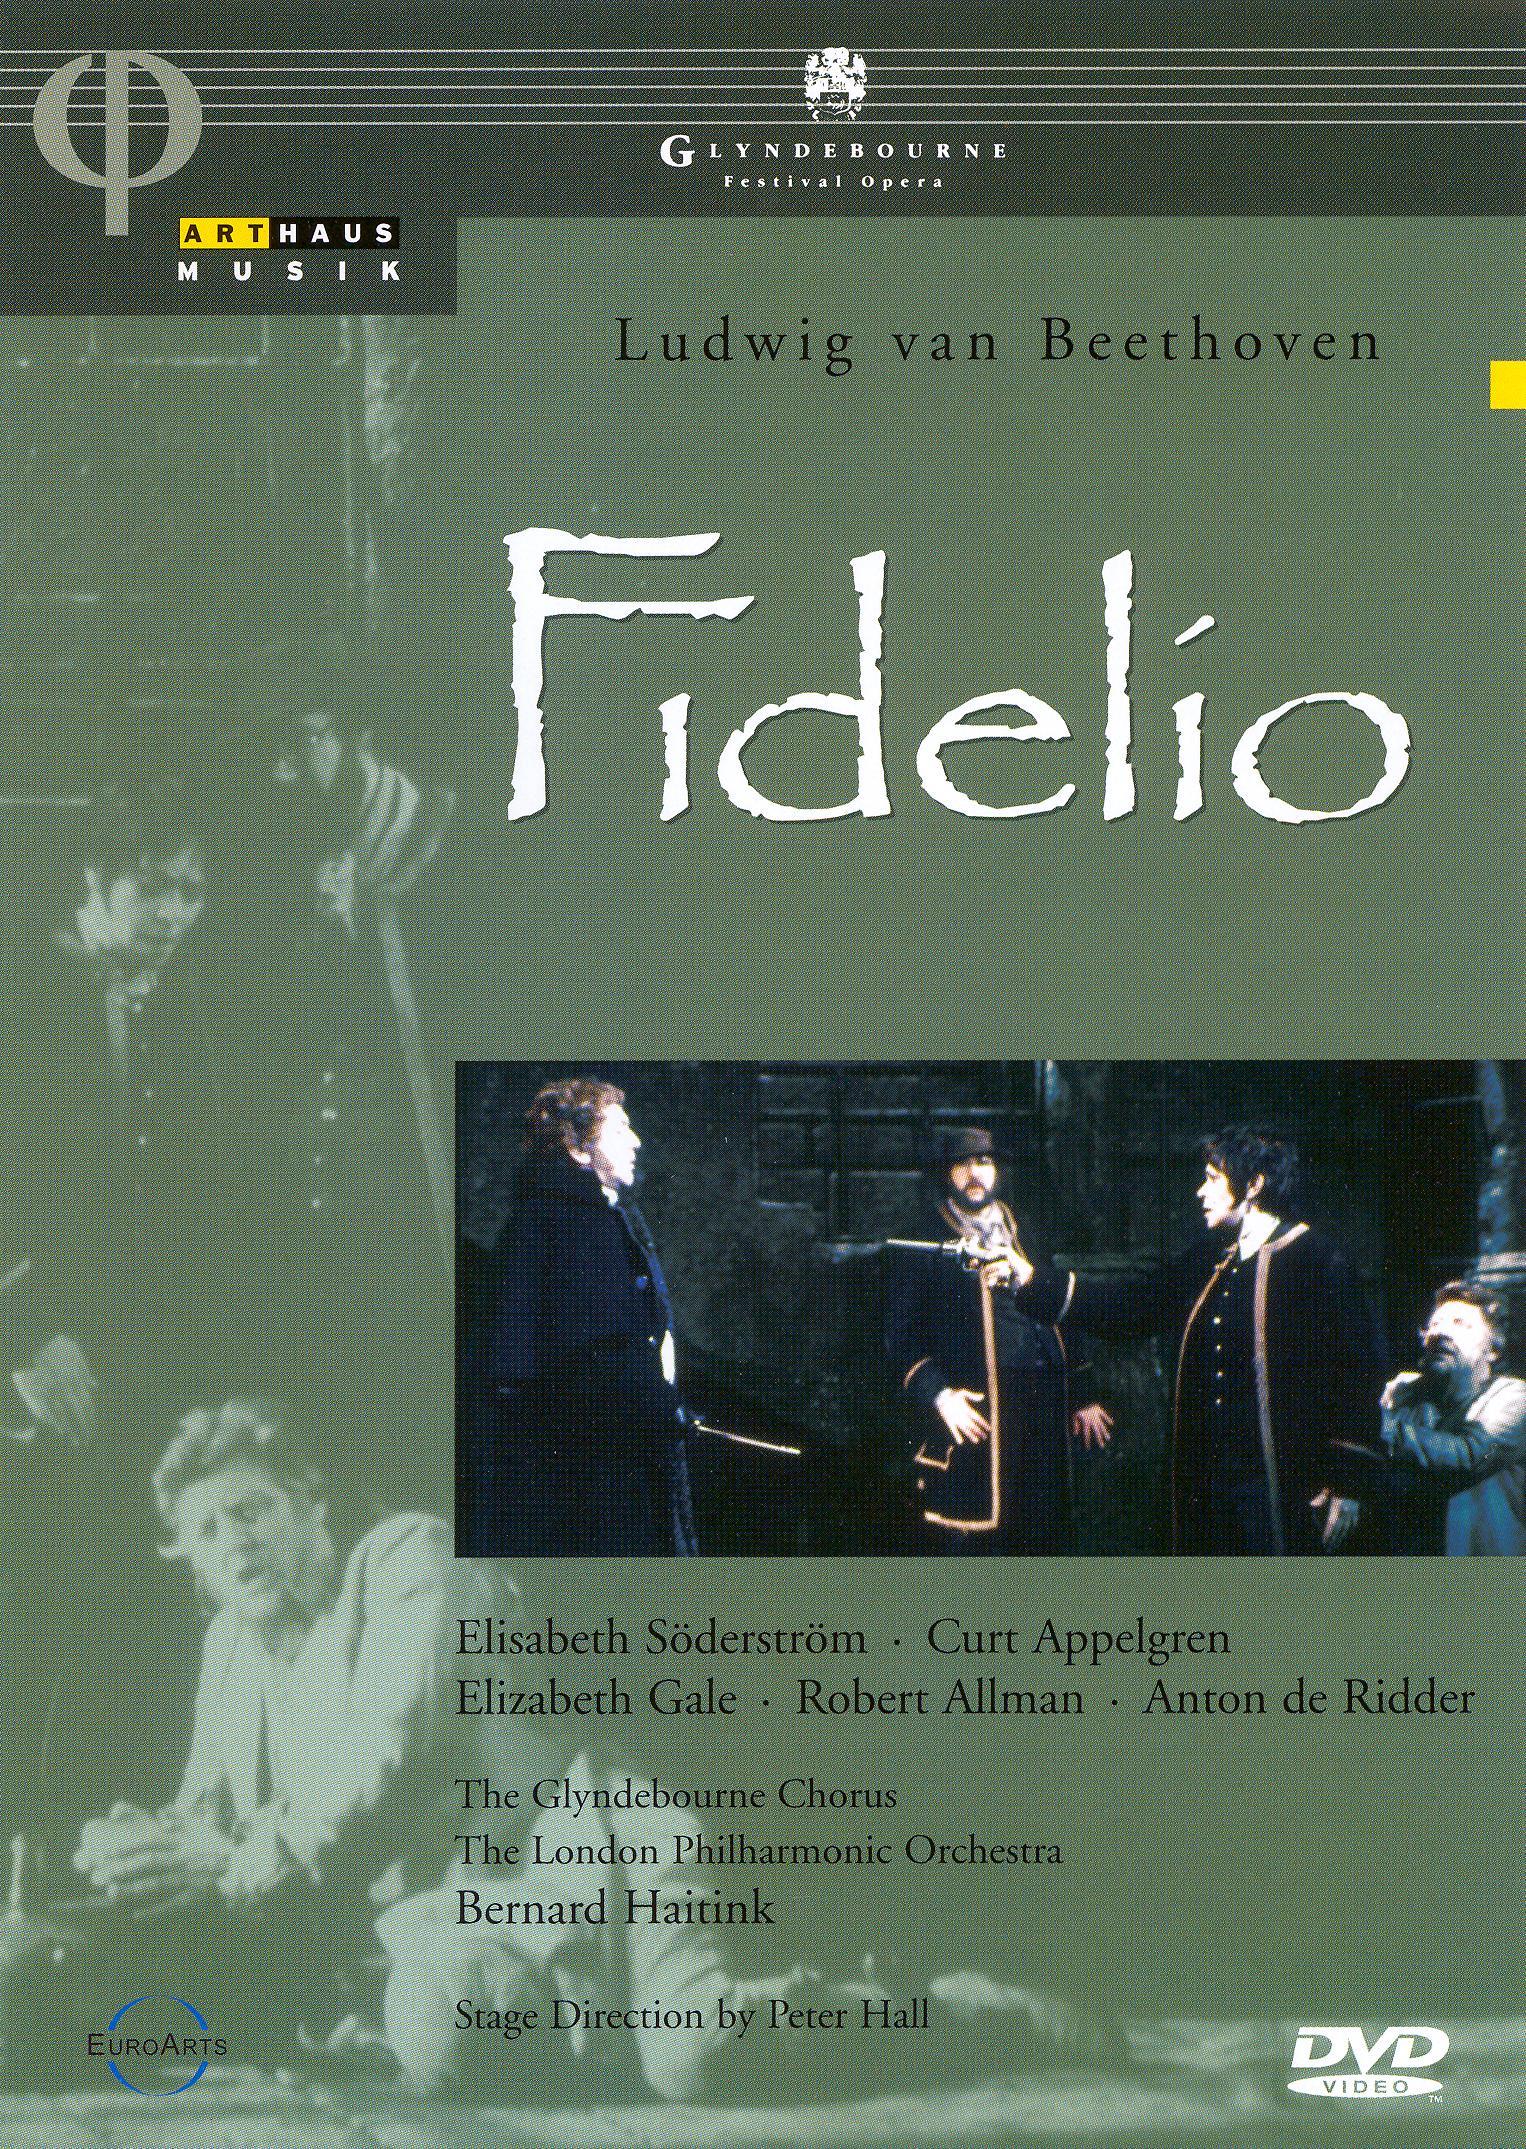 Fidelio (Glyndebourne Festival Opera)